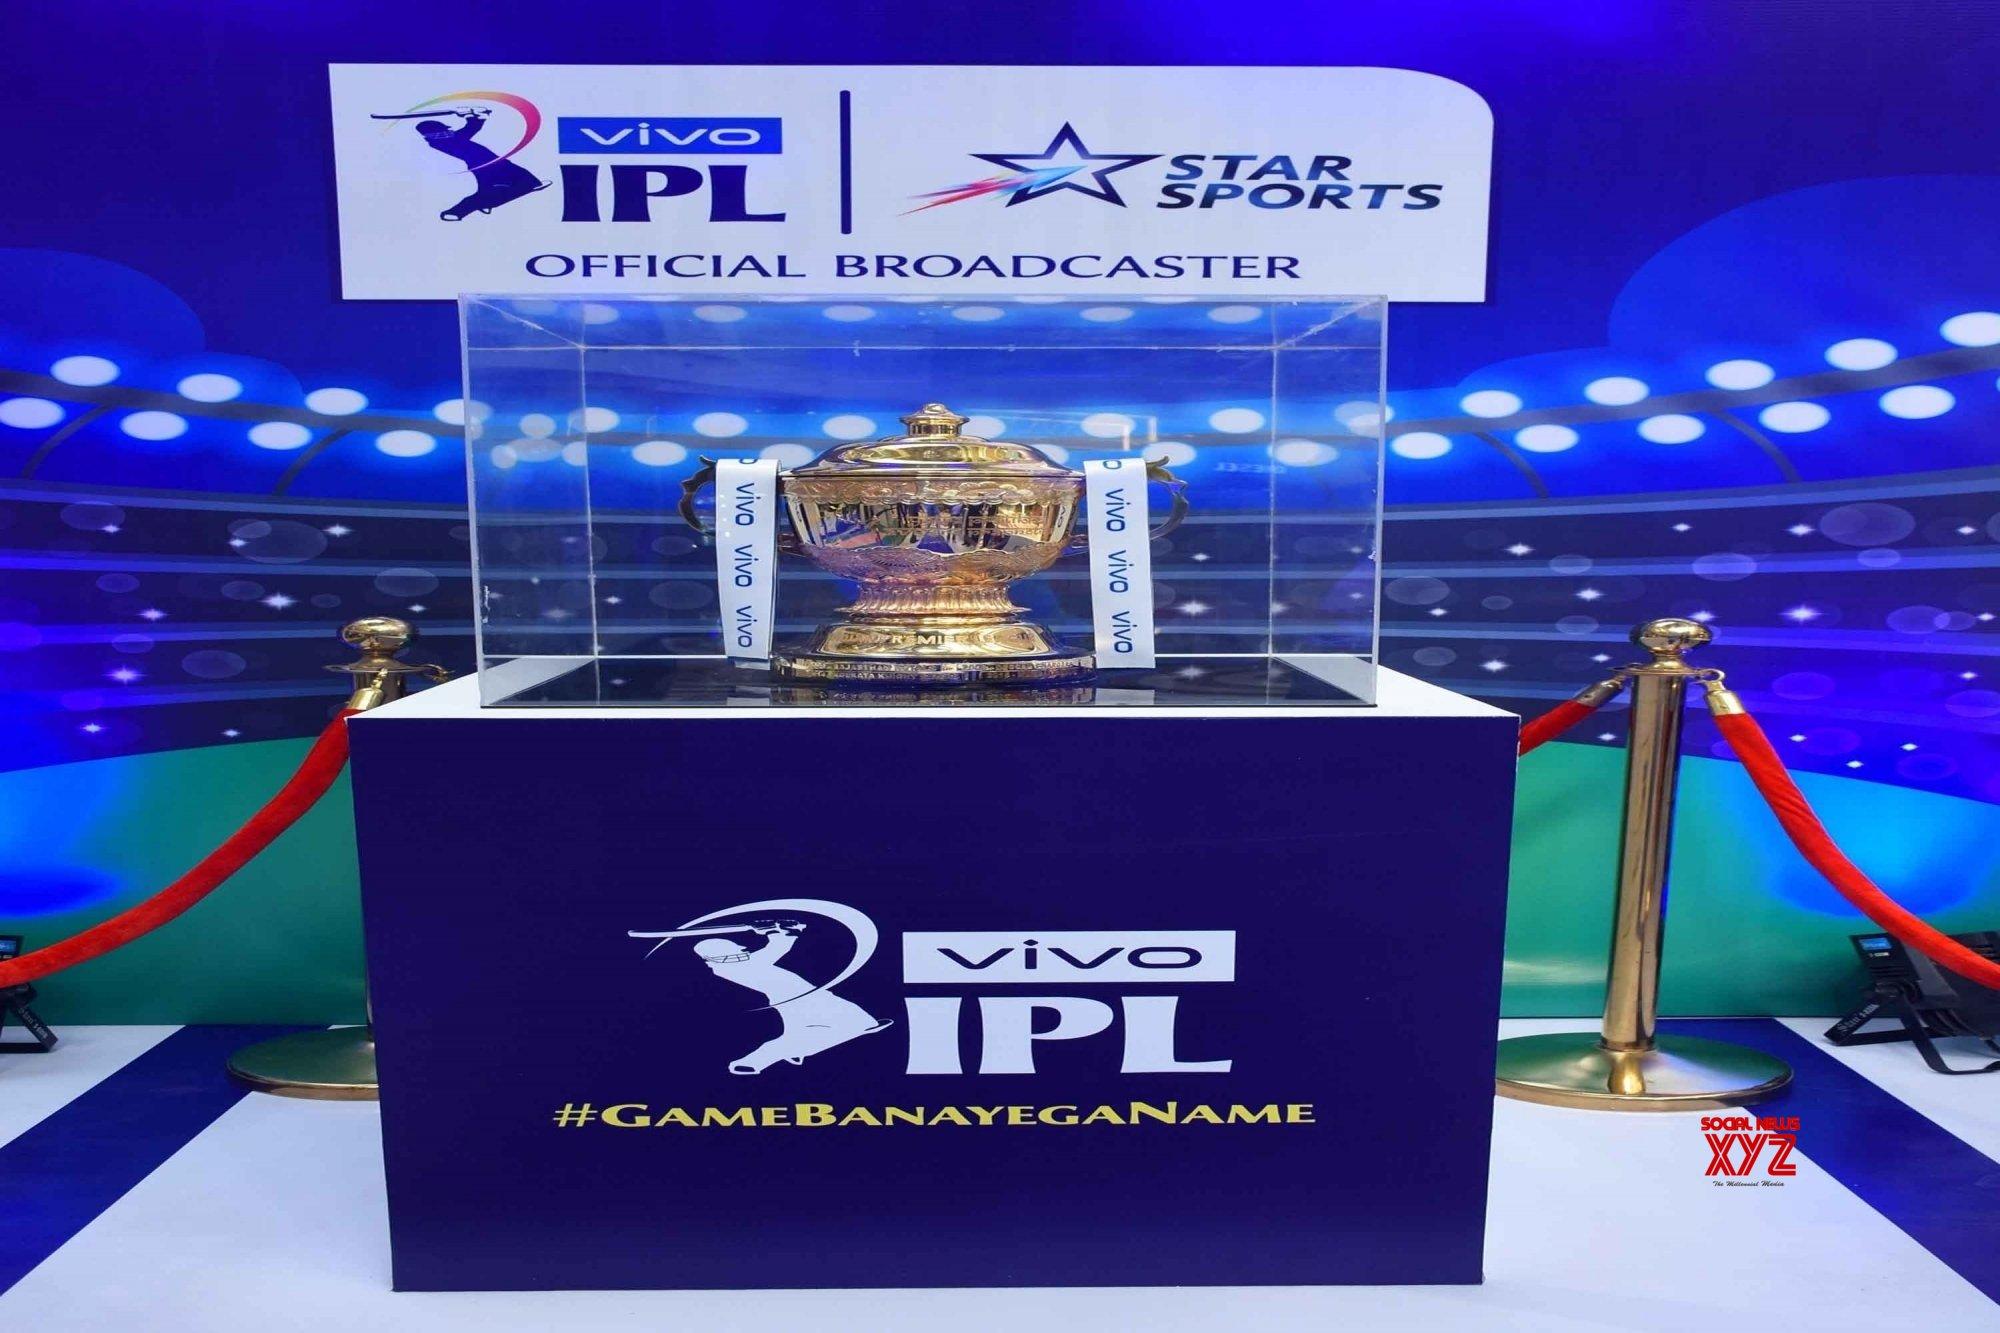 YuppTV bagged the IPL 2019 digital broadcasting rights